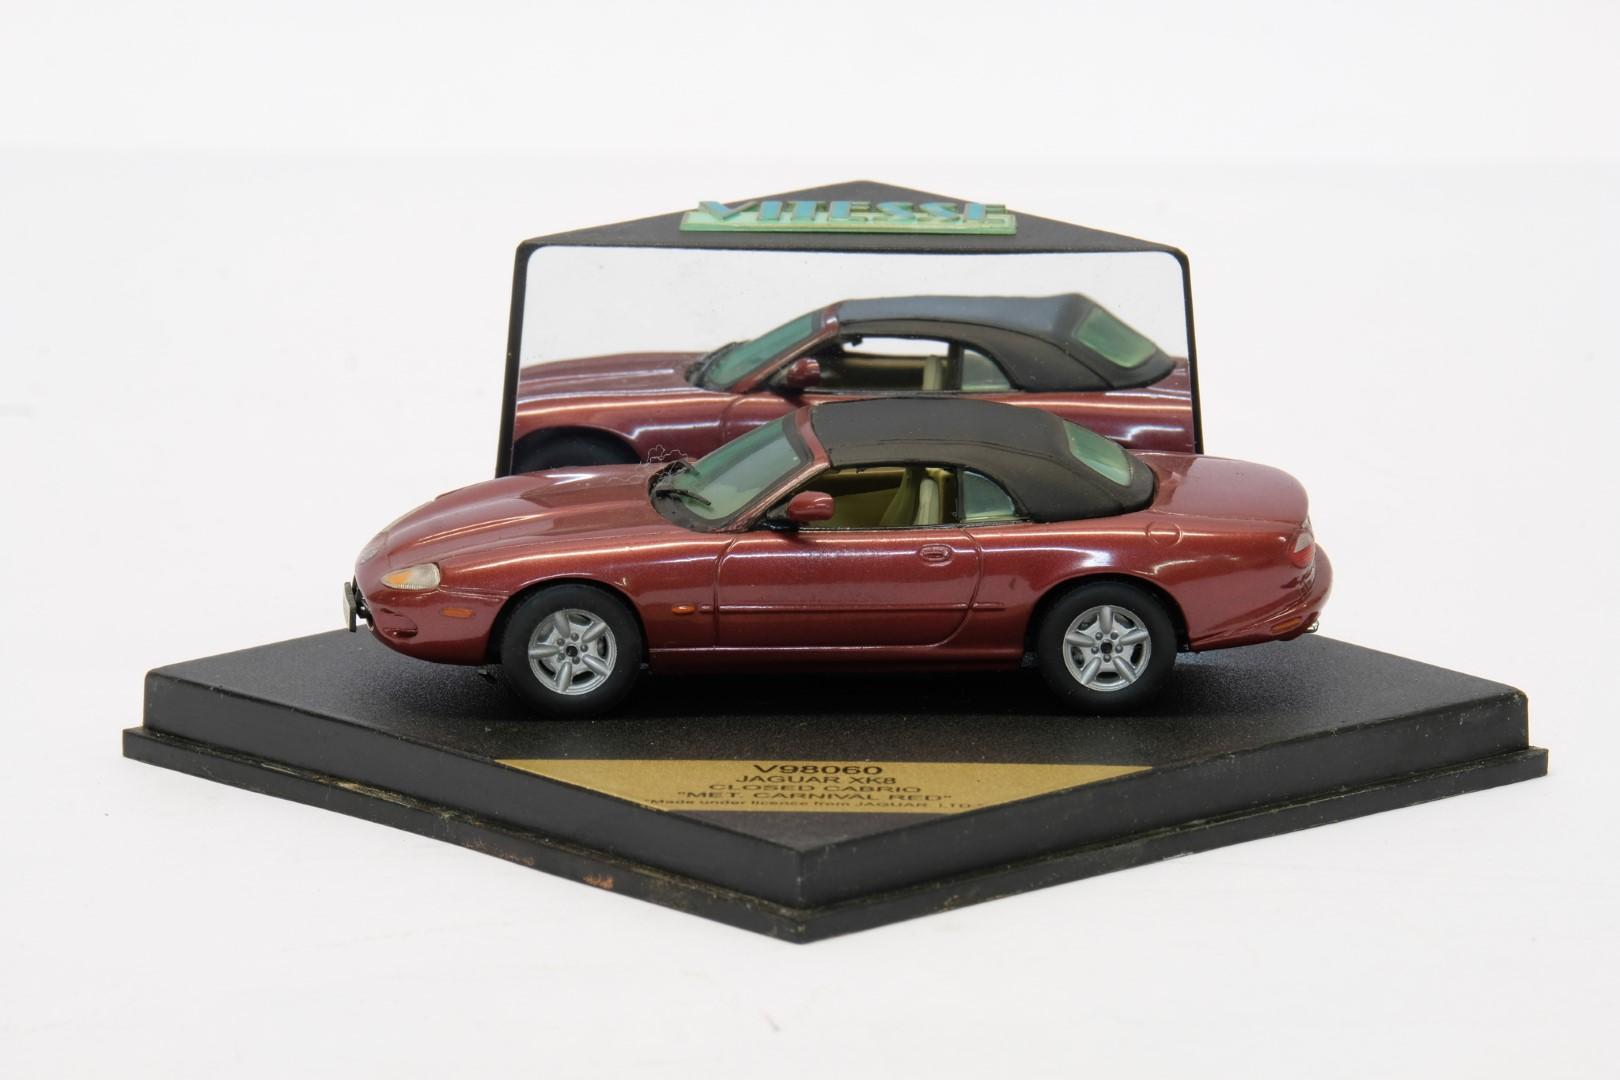 Vitesse Jaguar XK8 Closed Cabrio Met Carnival Red - Image 2 of 2